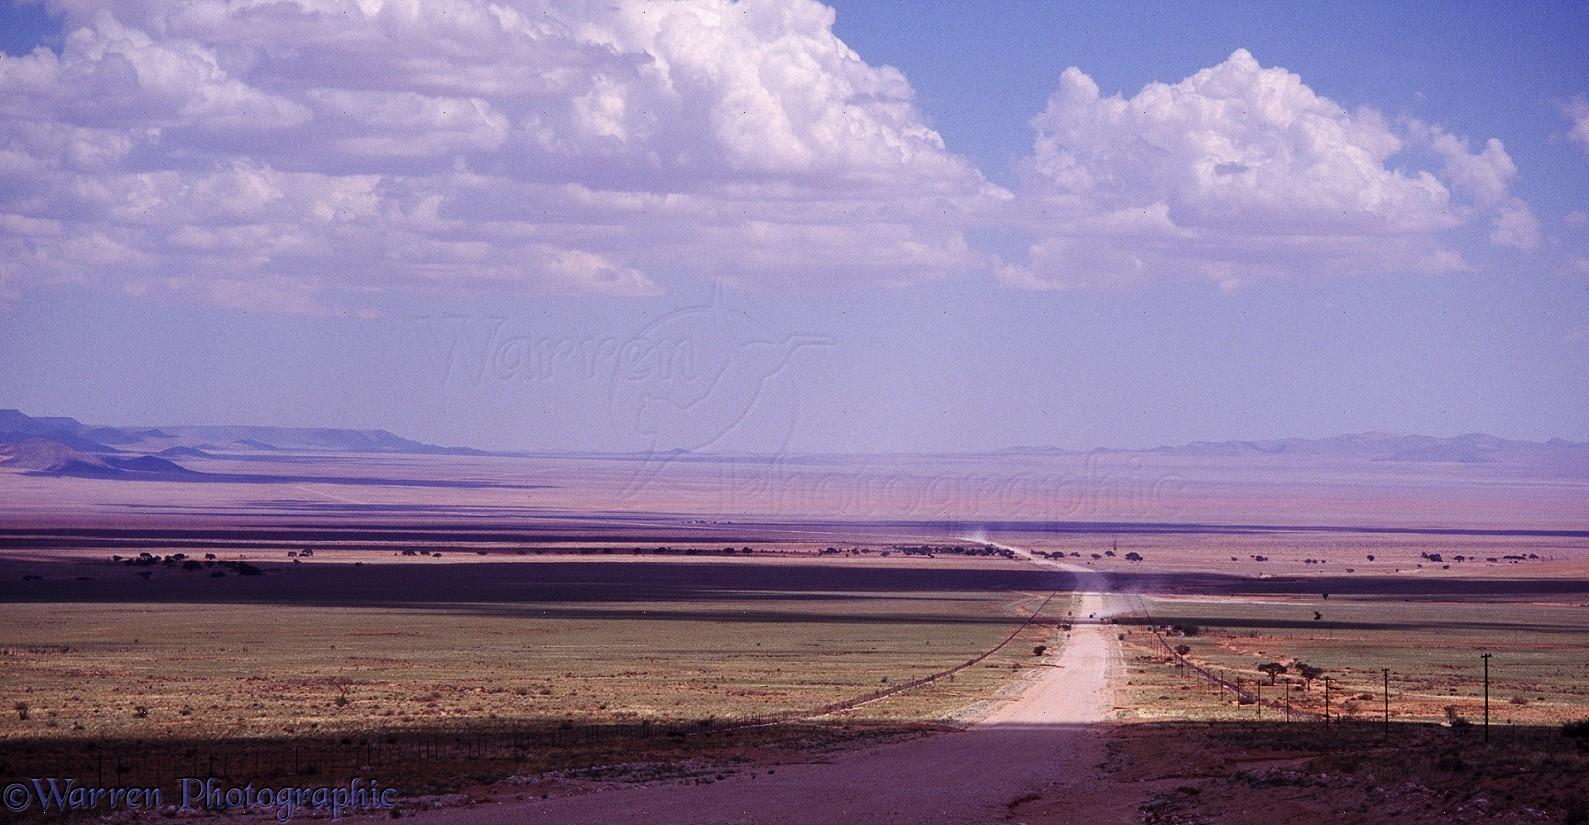 Southern Plains of Colorado